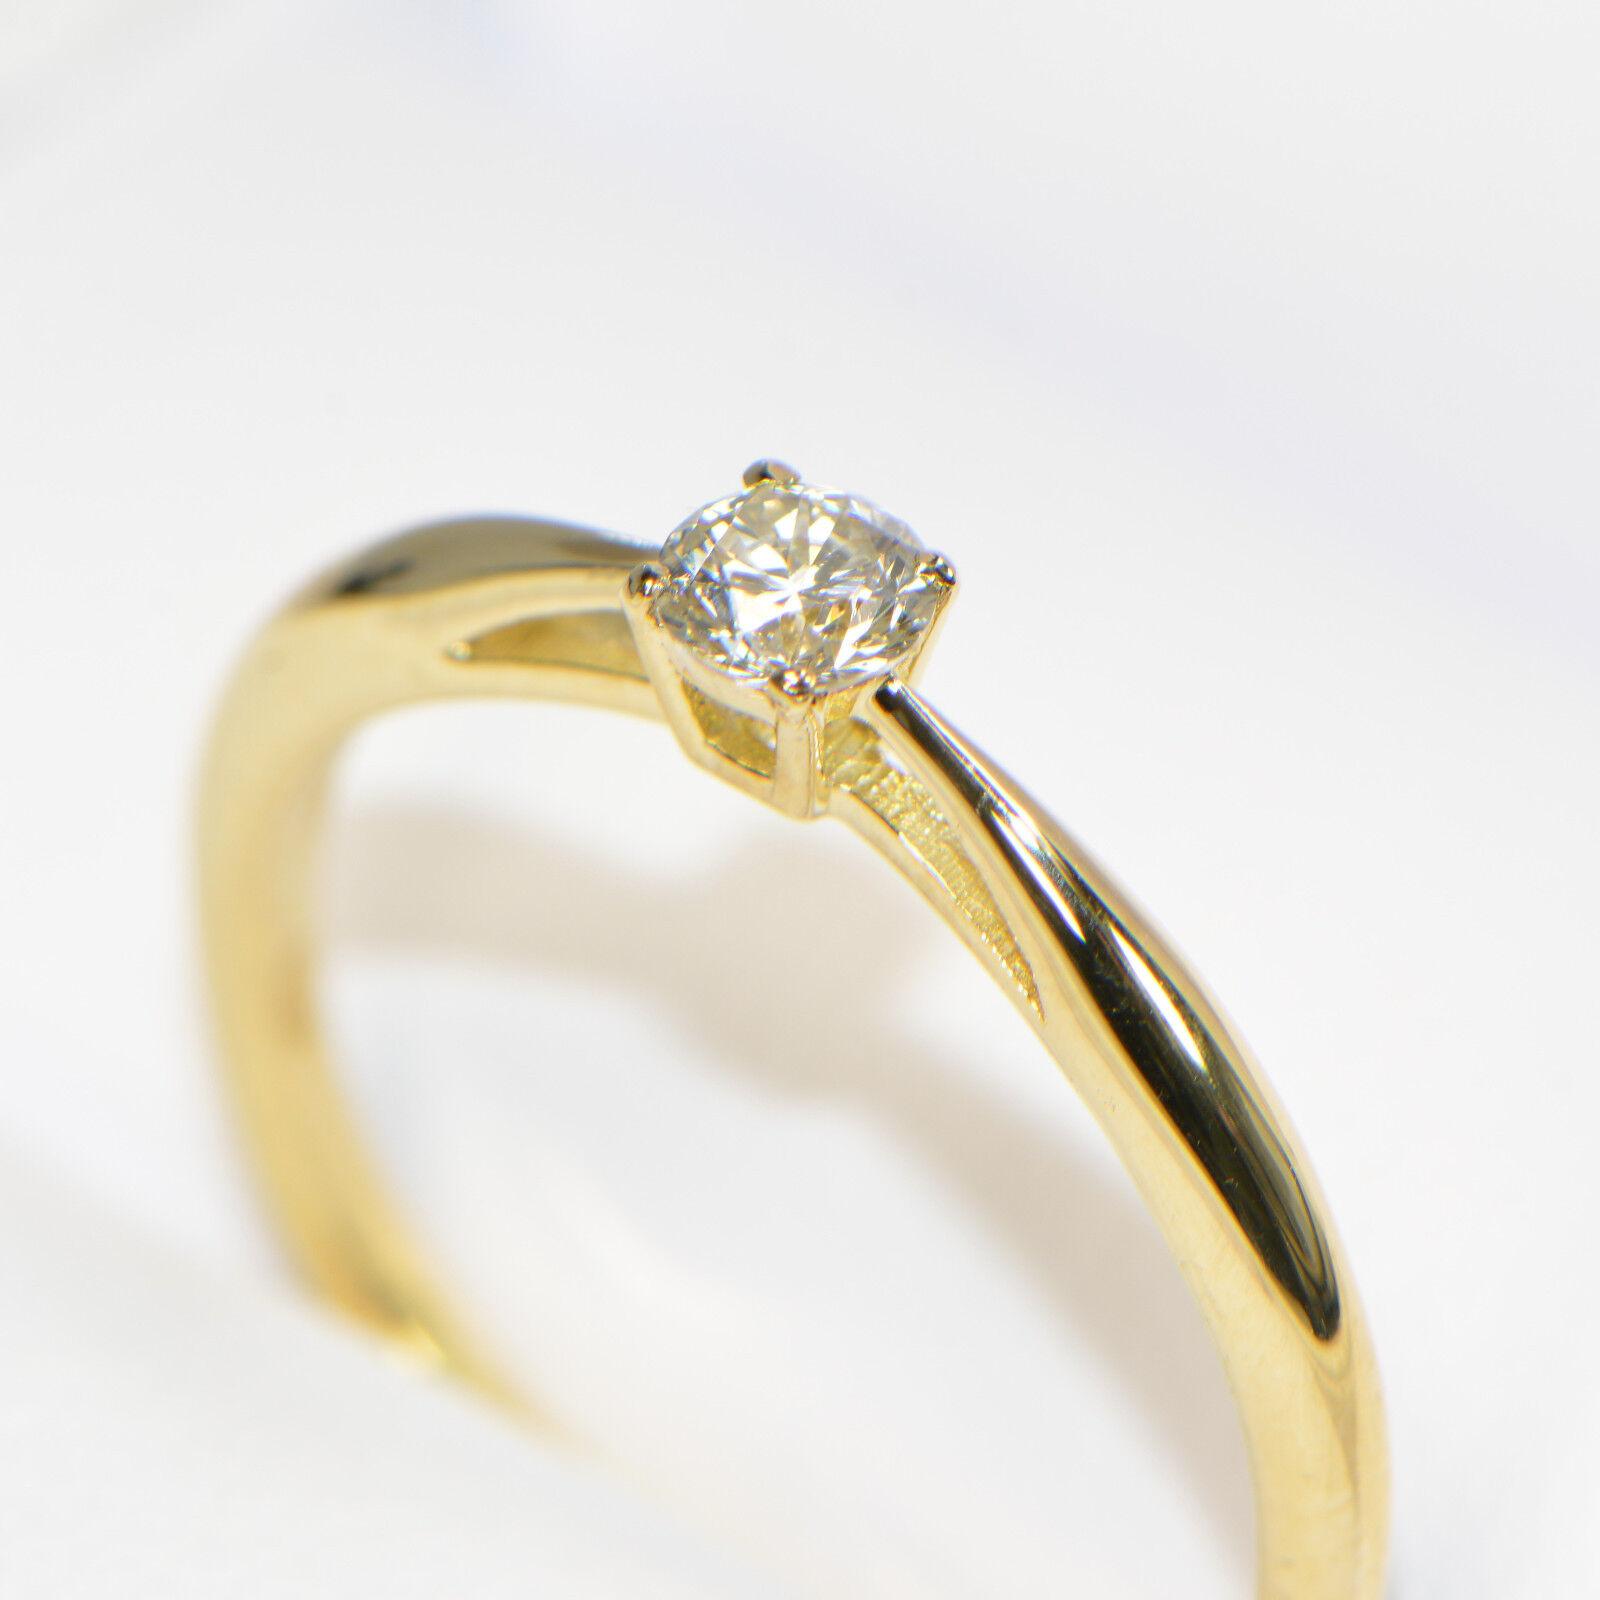 Diamantring 0,19 ct in yellowgold (18K) Solitär Verlobung Brillant 4 Krappen